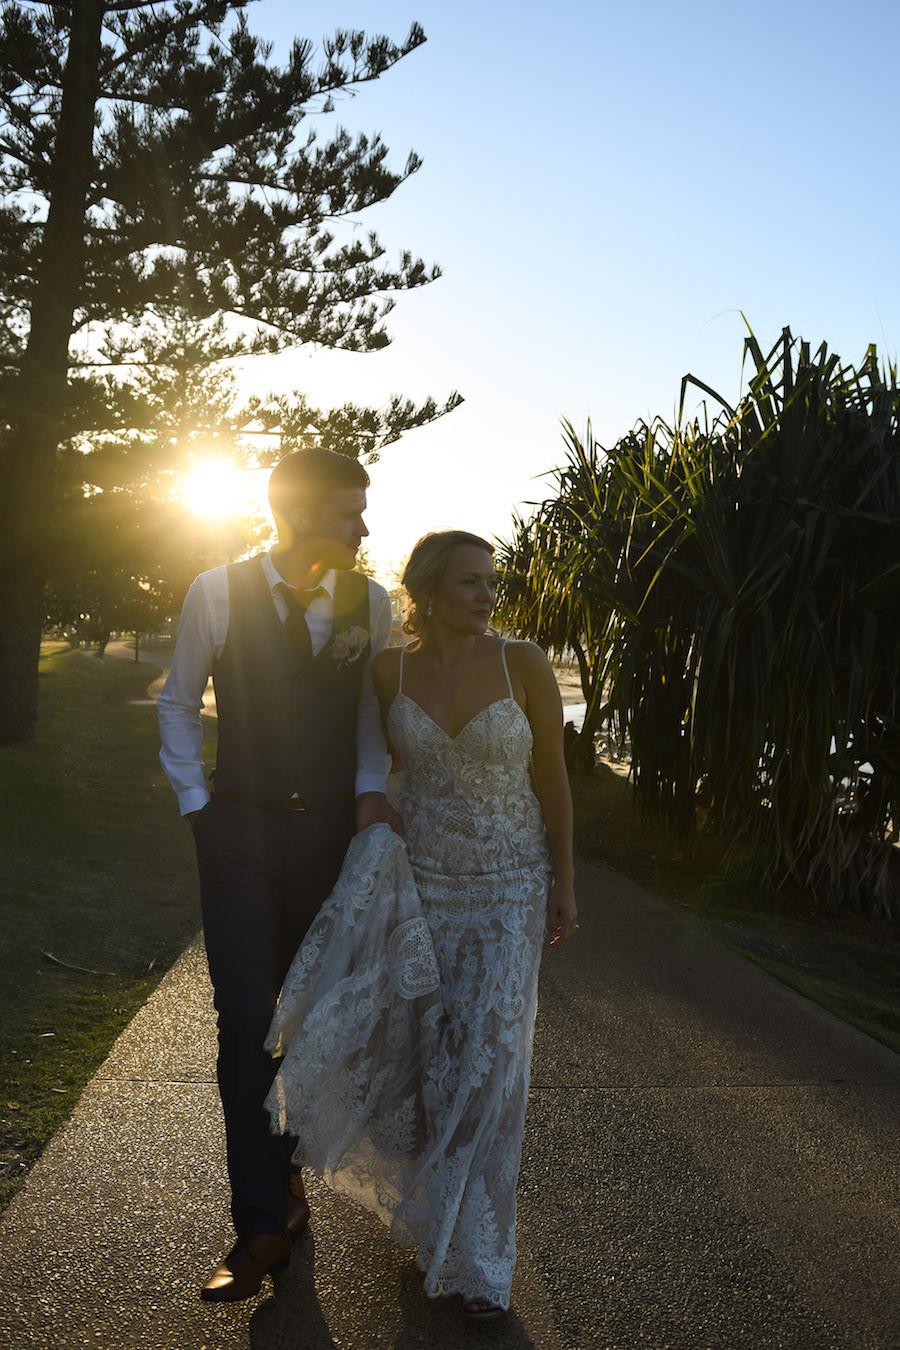 Burleigh Hill wedding photography